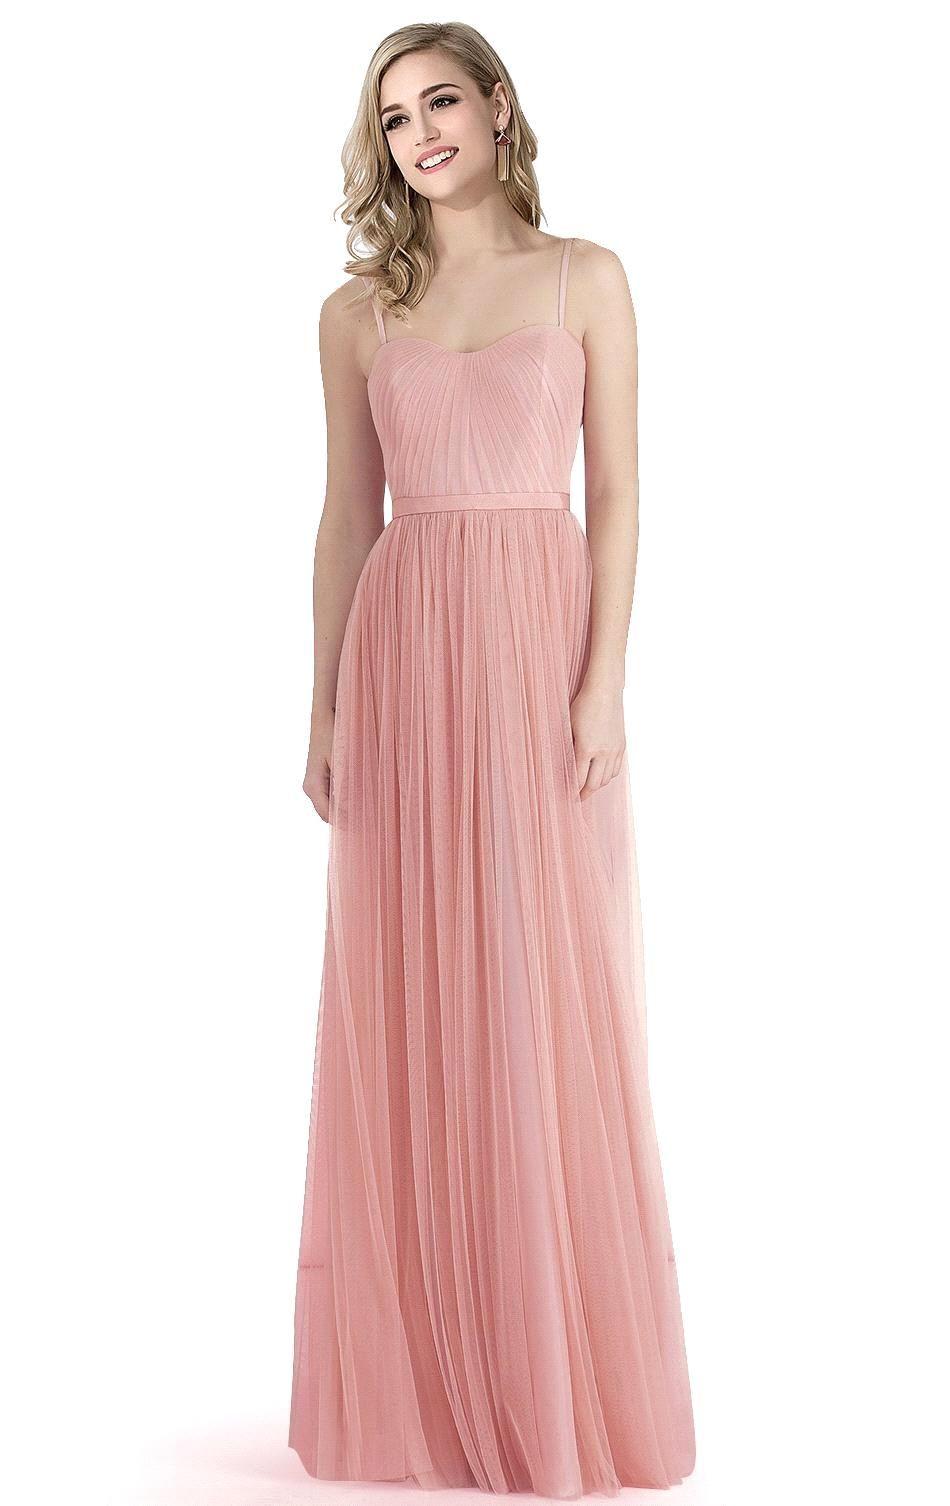 Elegant sweetheart ruffles sash bridesmaid dress uniqistic